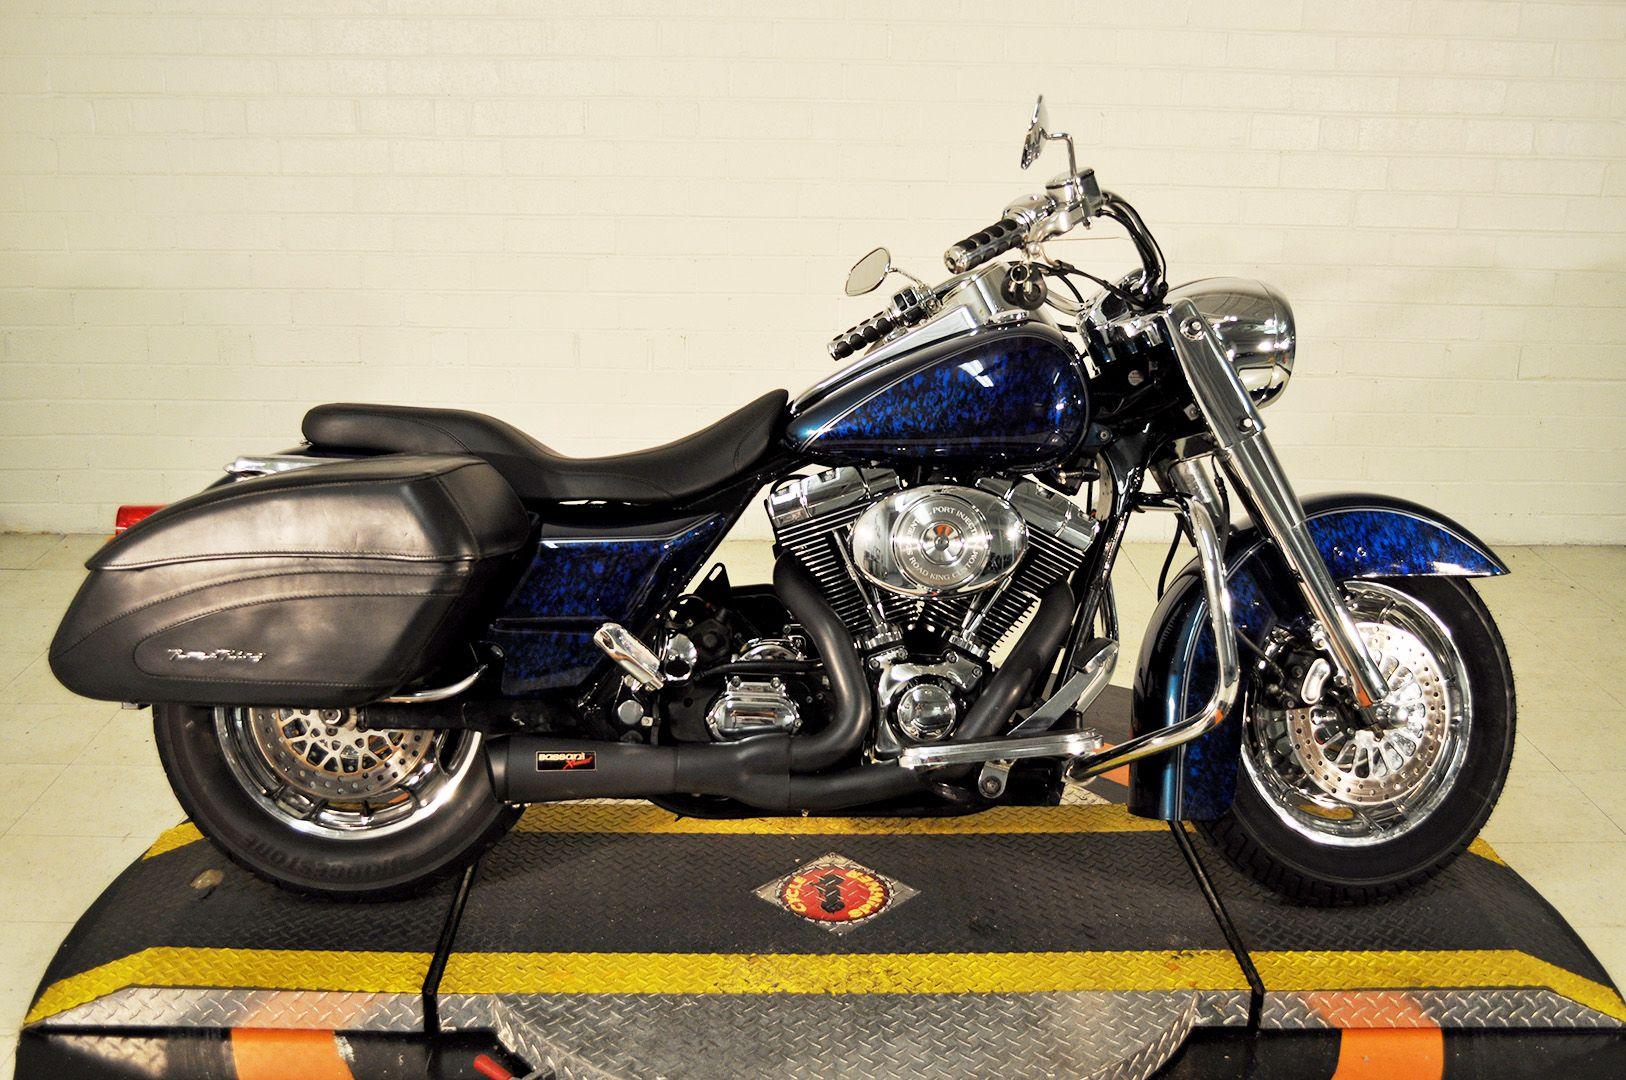 Pre Owned 2004 Harley Davidson Road King Custom In Winston Salem Tn730681 Smokin Harley Davidson